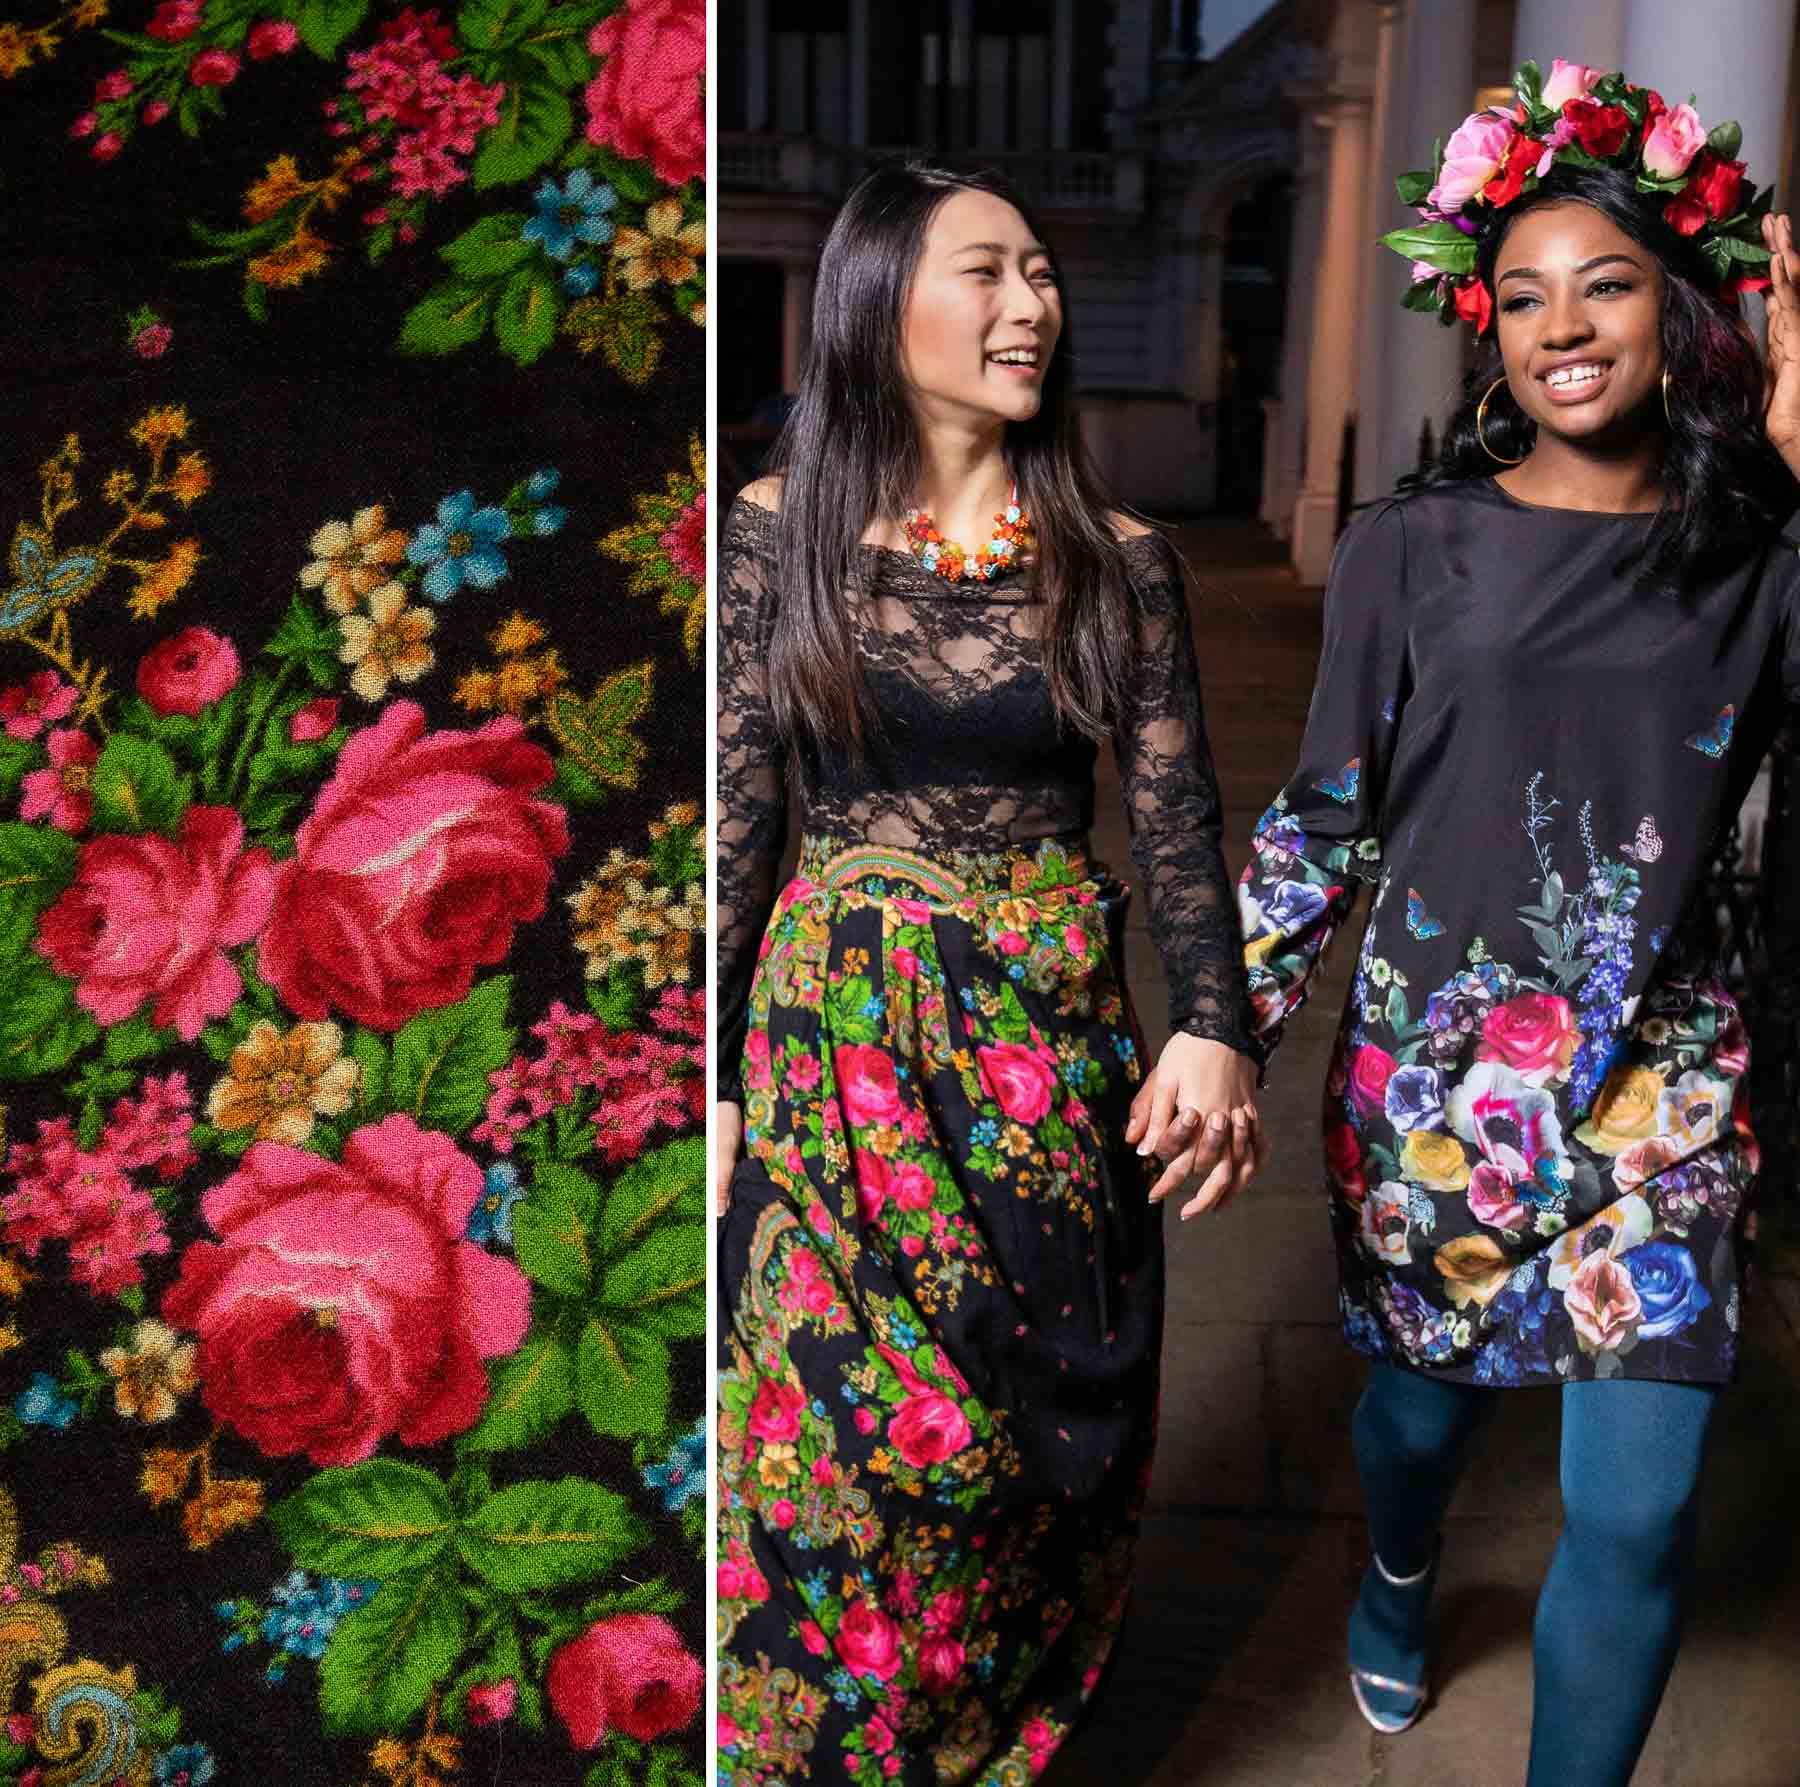 Russian-style-fashion-photographer-london-floral-Русский-стиль-мода-павловопосадский-платок-natalia-smith-photography-0090.jpg